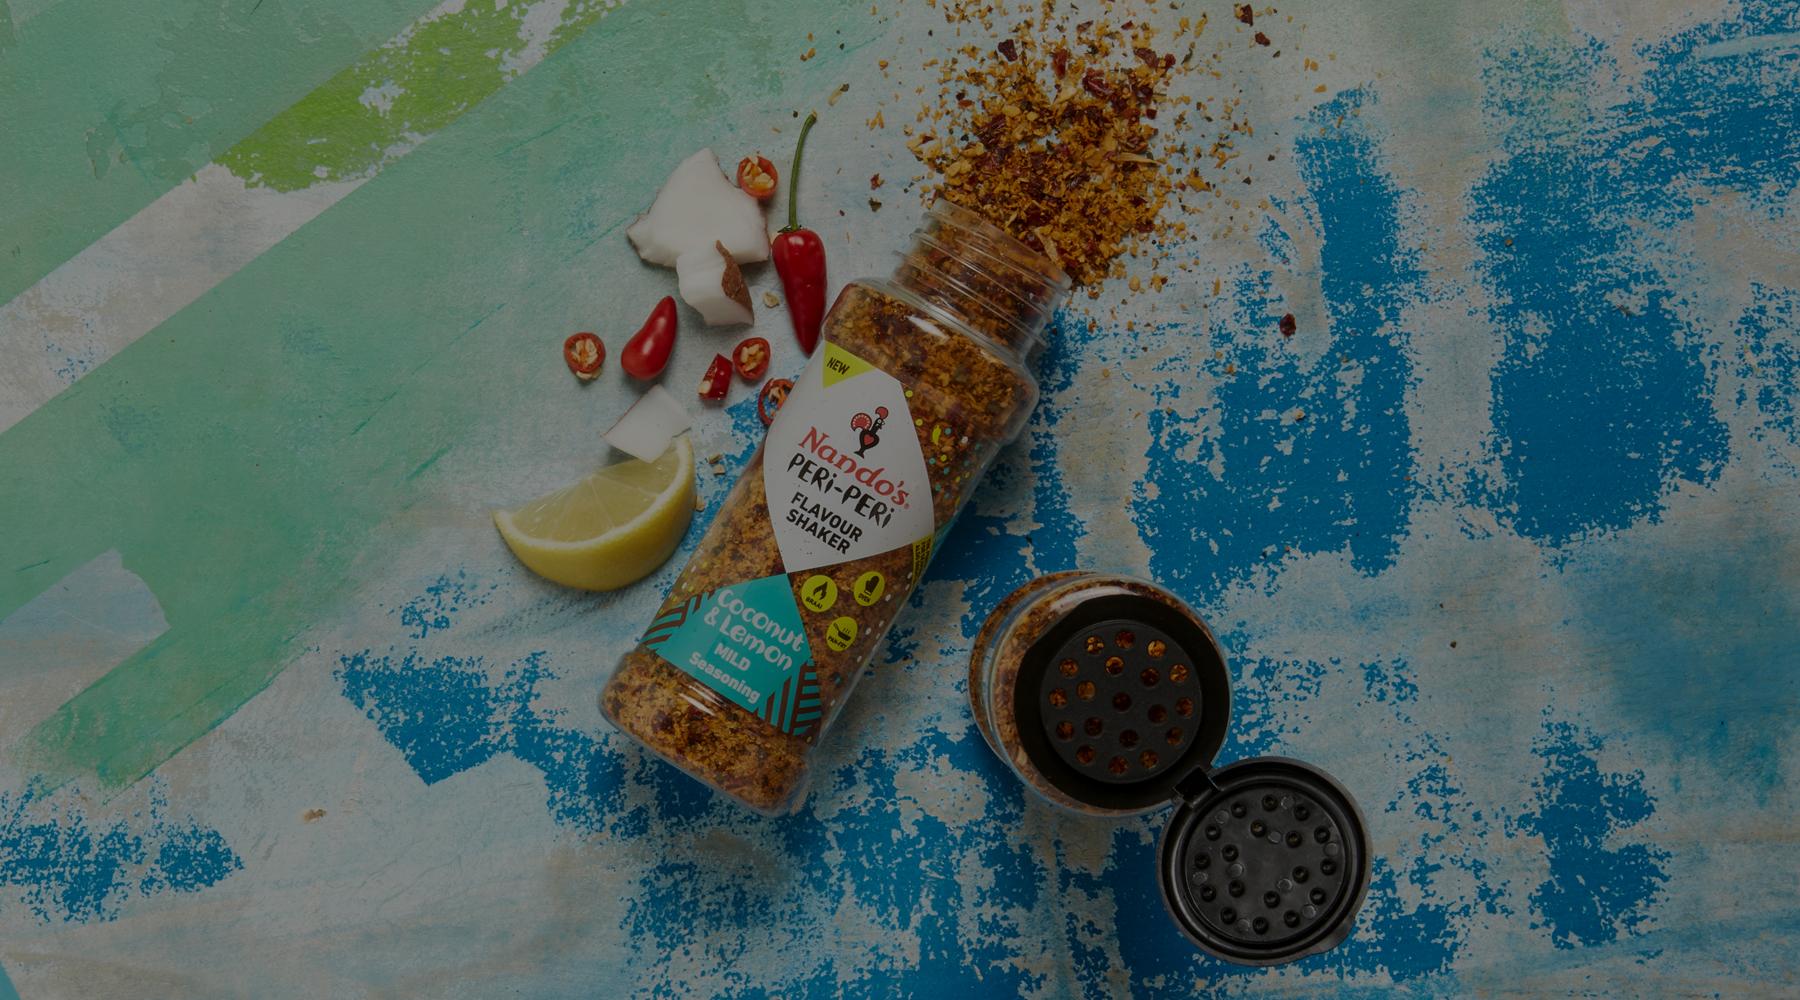 Flavour Shaker Coconut & Lemon Seasoning